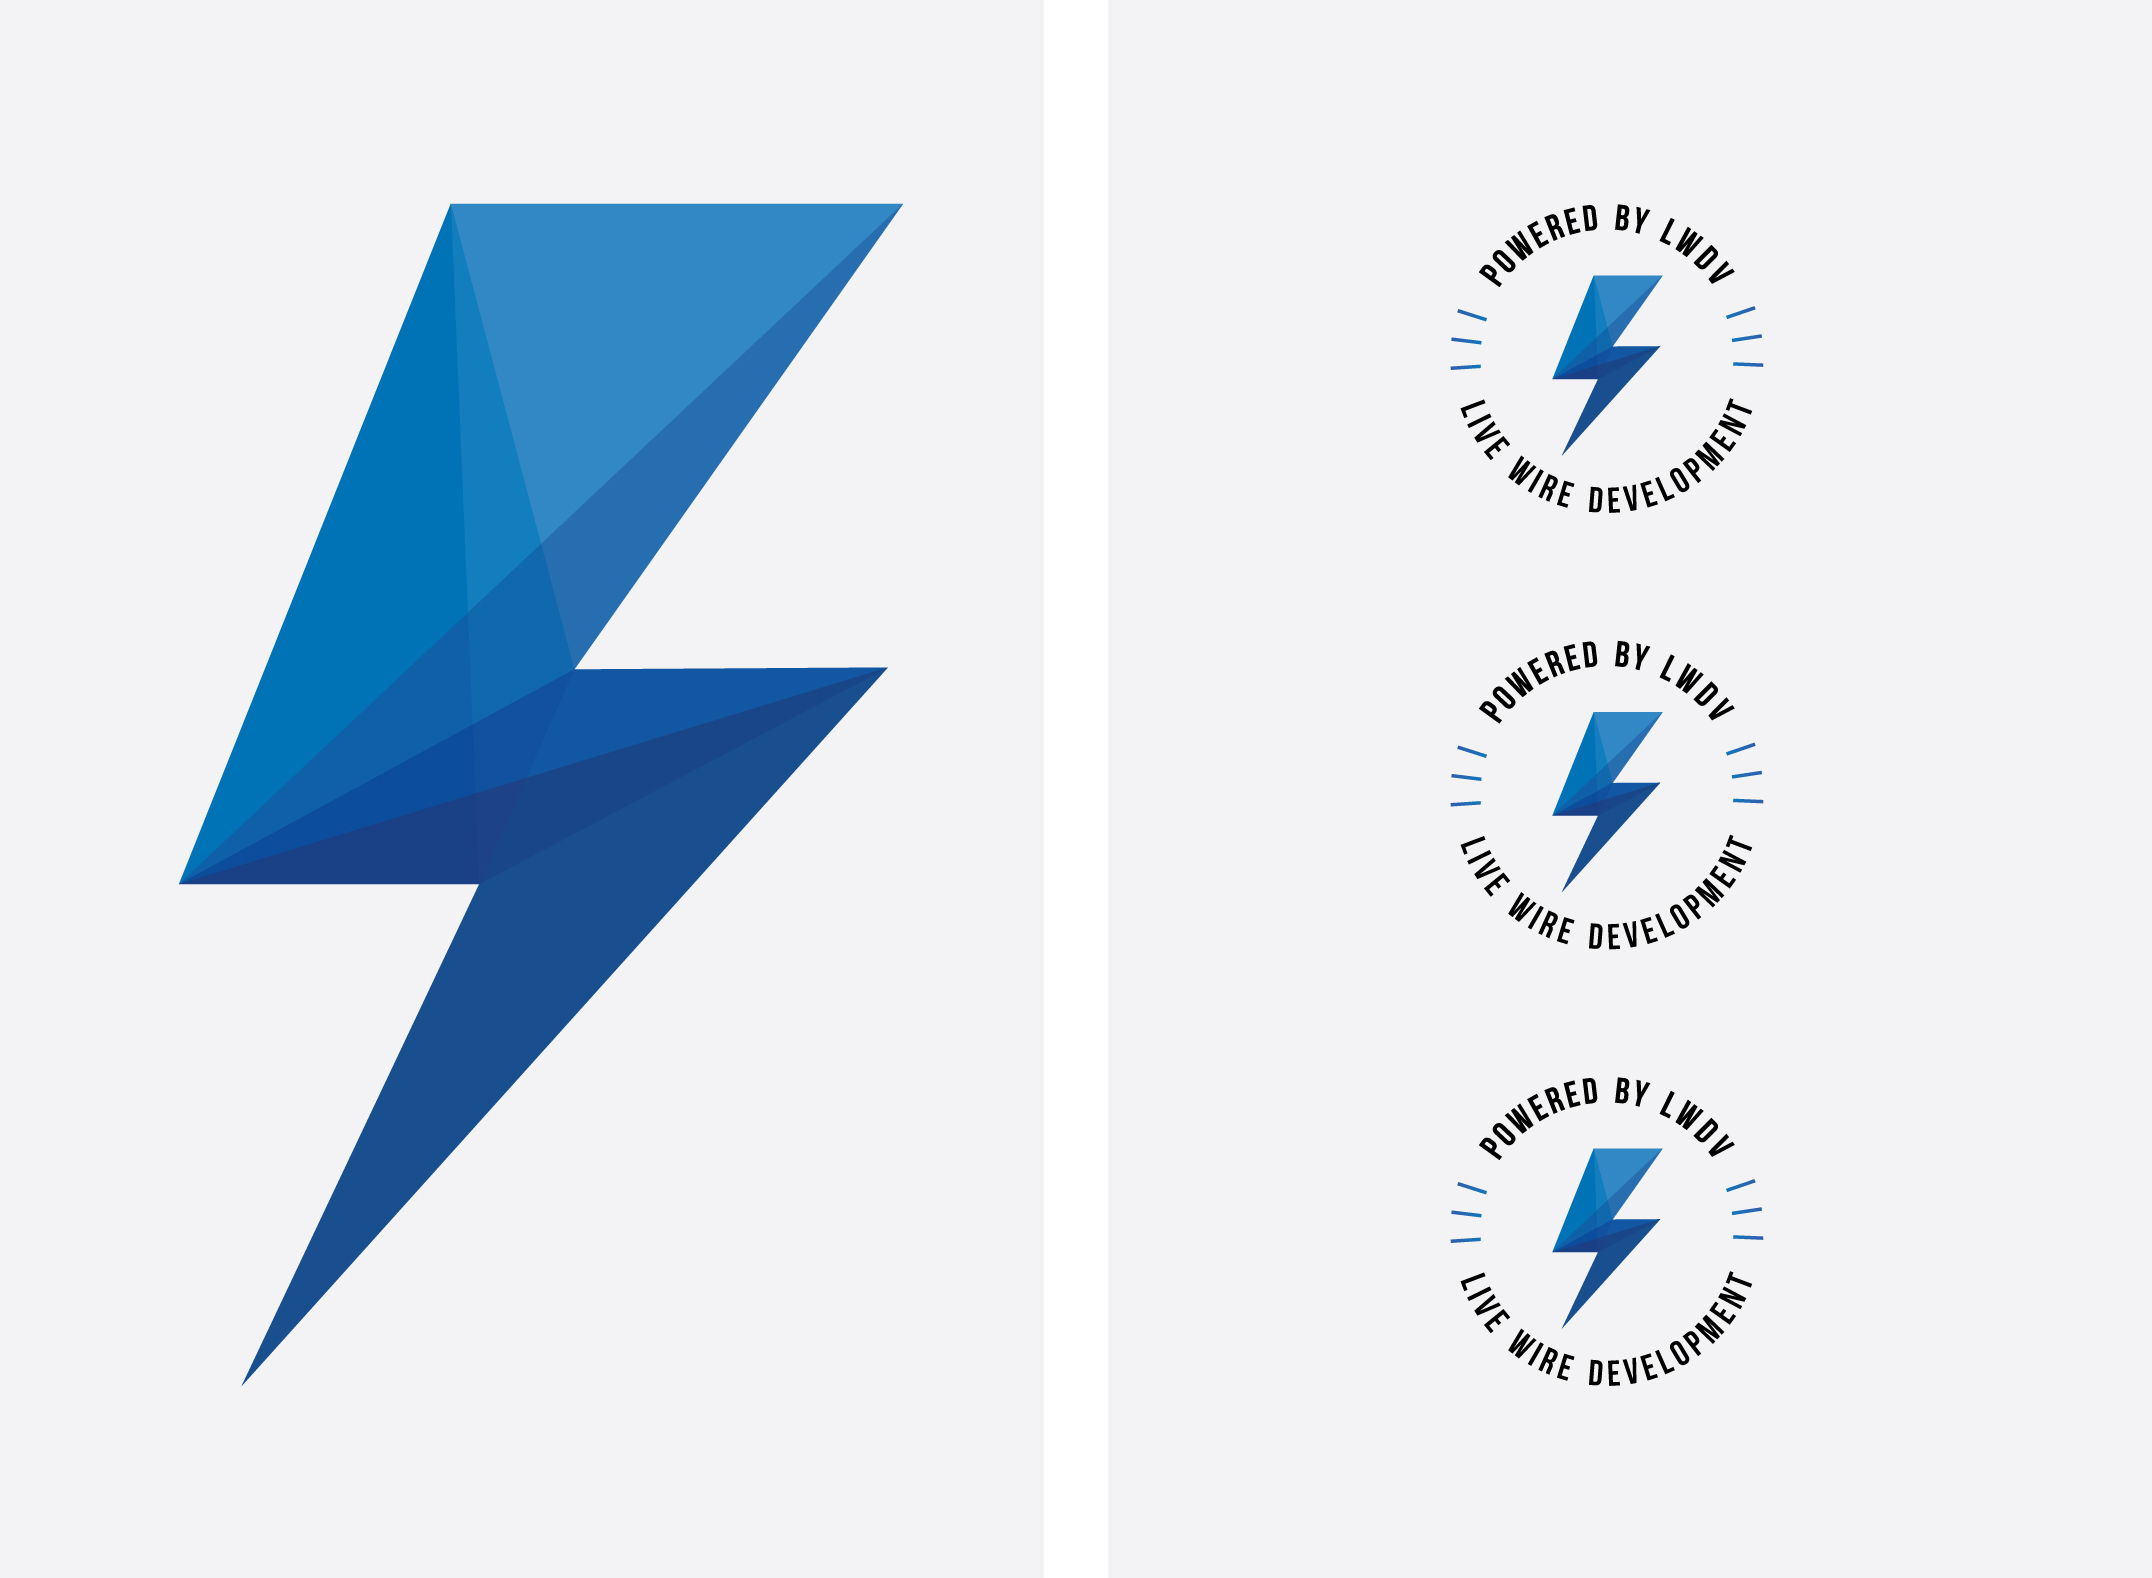 LWDV_Case-study-icon-stamp.jpg